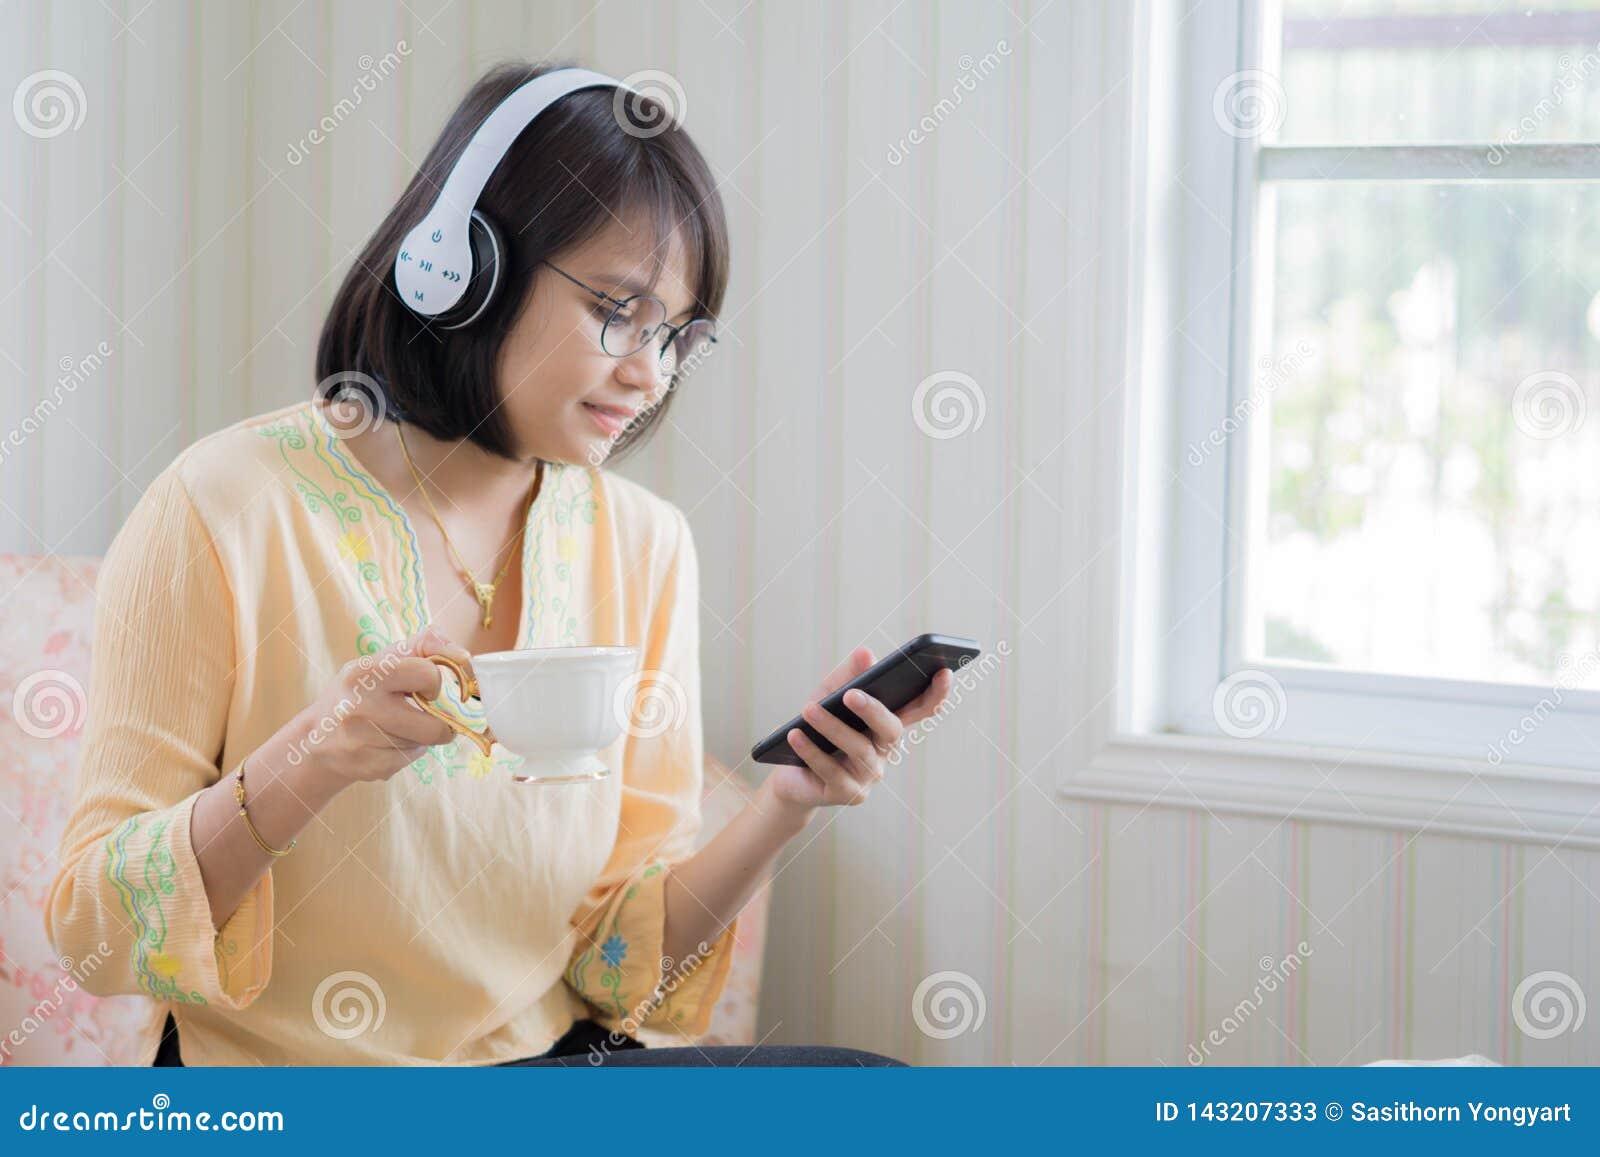 Piękna kobieta relaksuje dalej z hełmofonami i smartphone